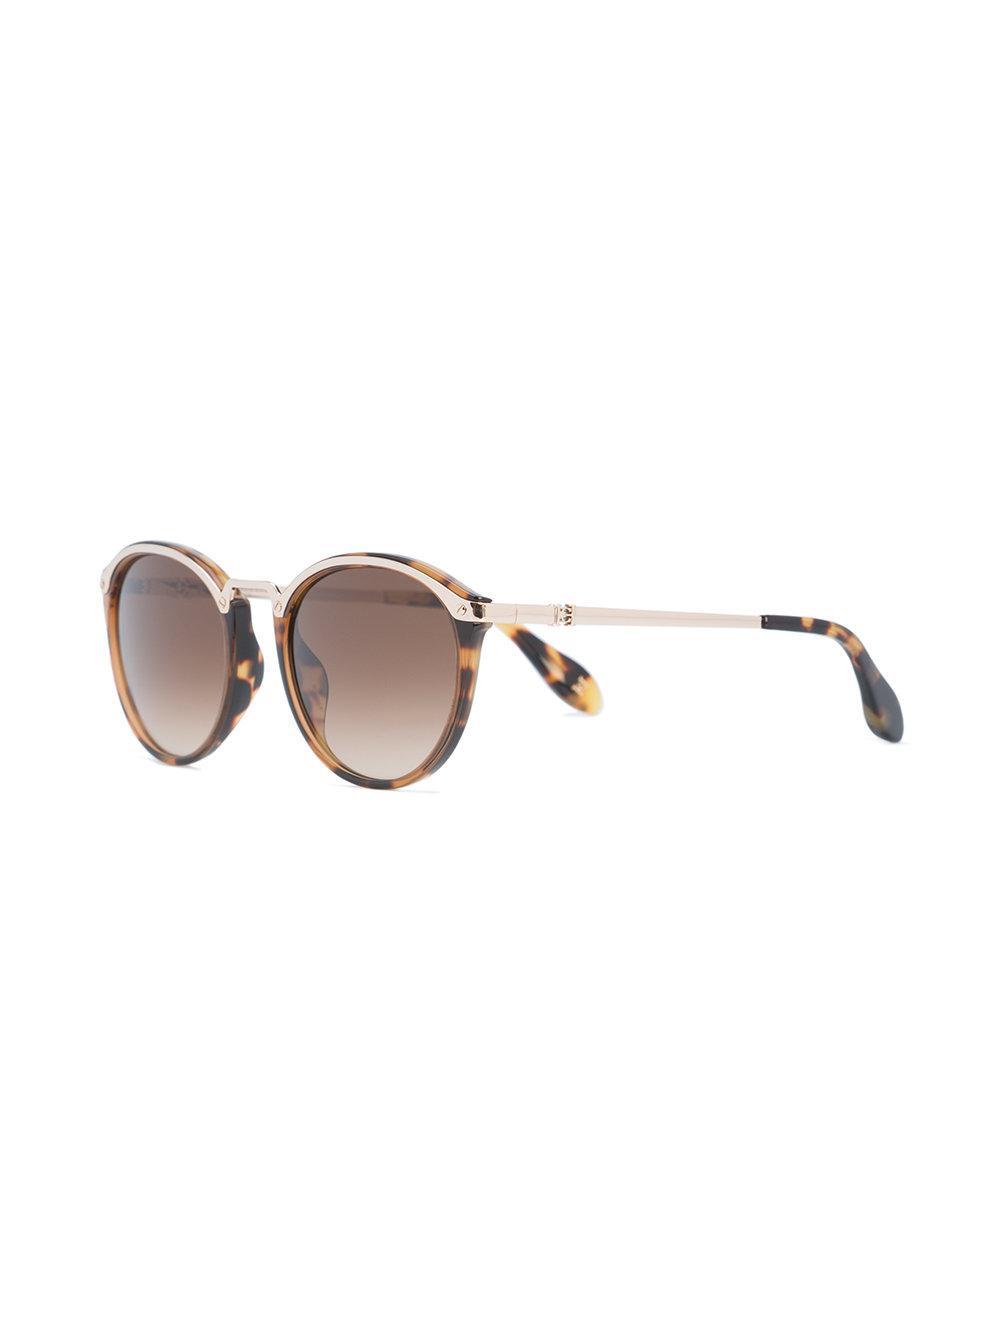 Lyst - Gafas de sol con montura redonda de carey Carolina Herrera de ... f24070c17e4a